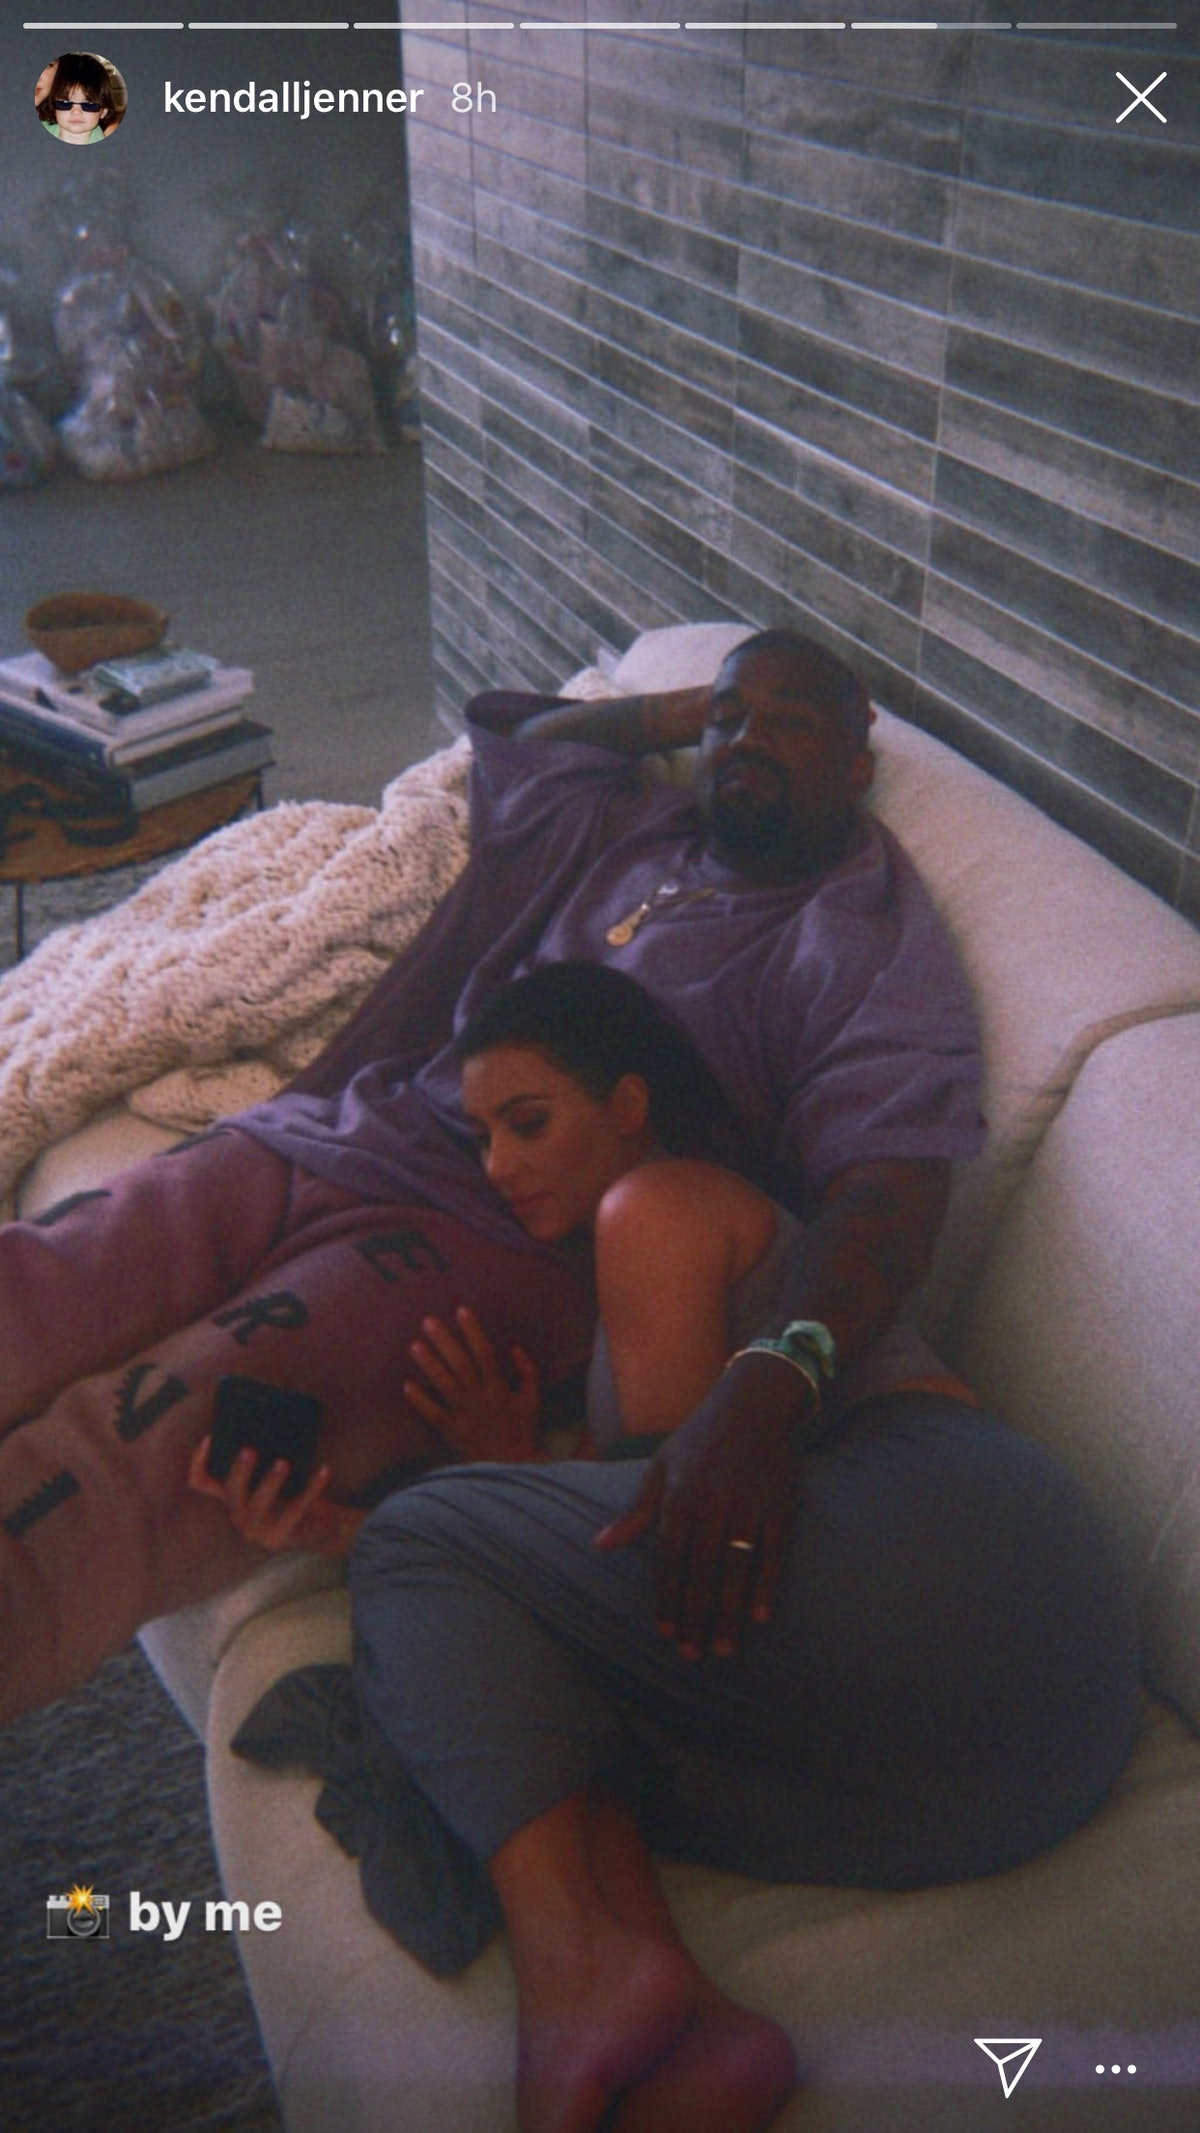 The Kardashians' Instagrams For Kim's 39th Birthday